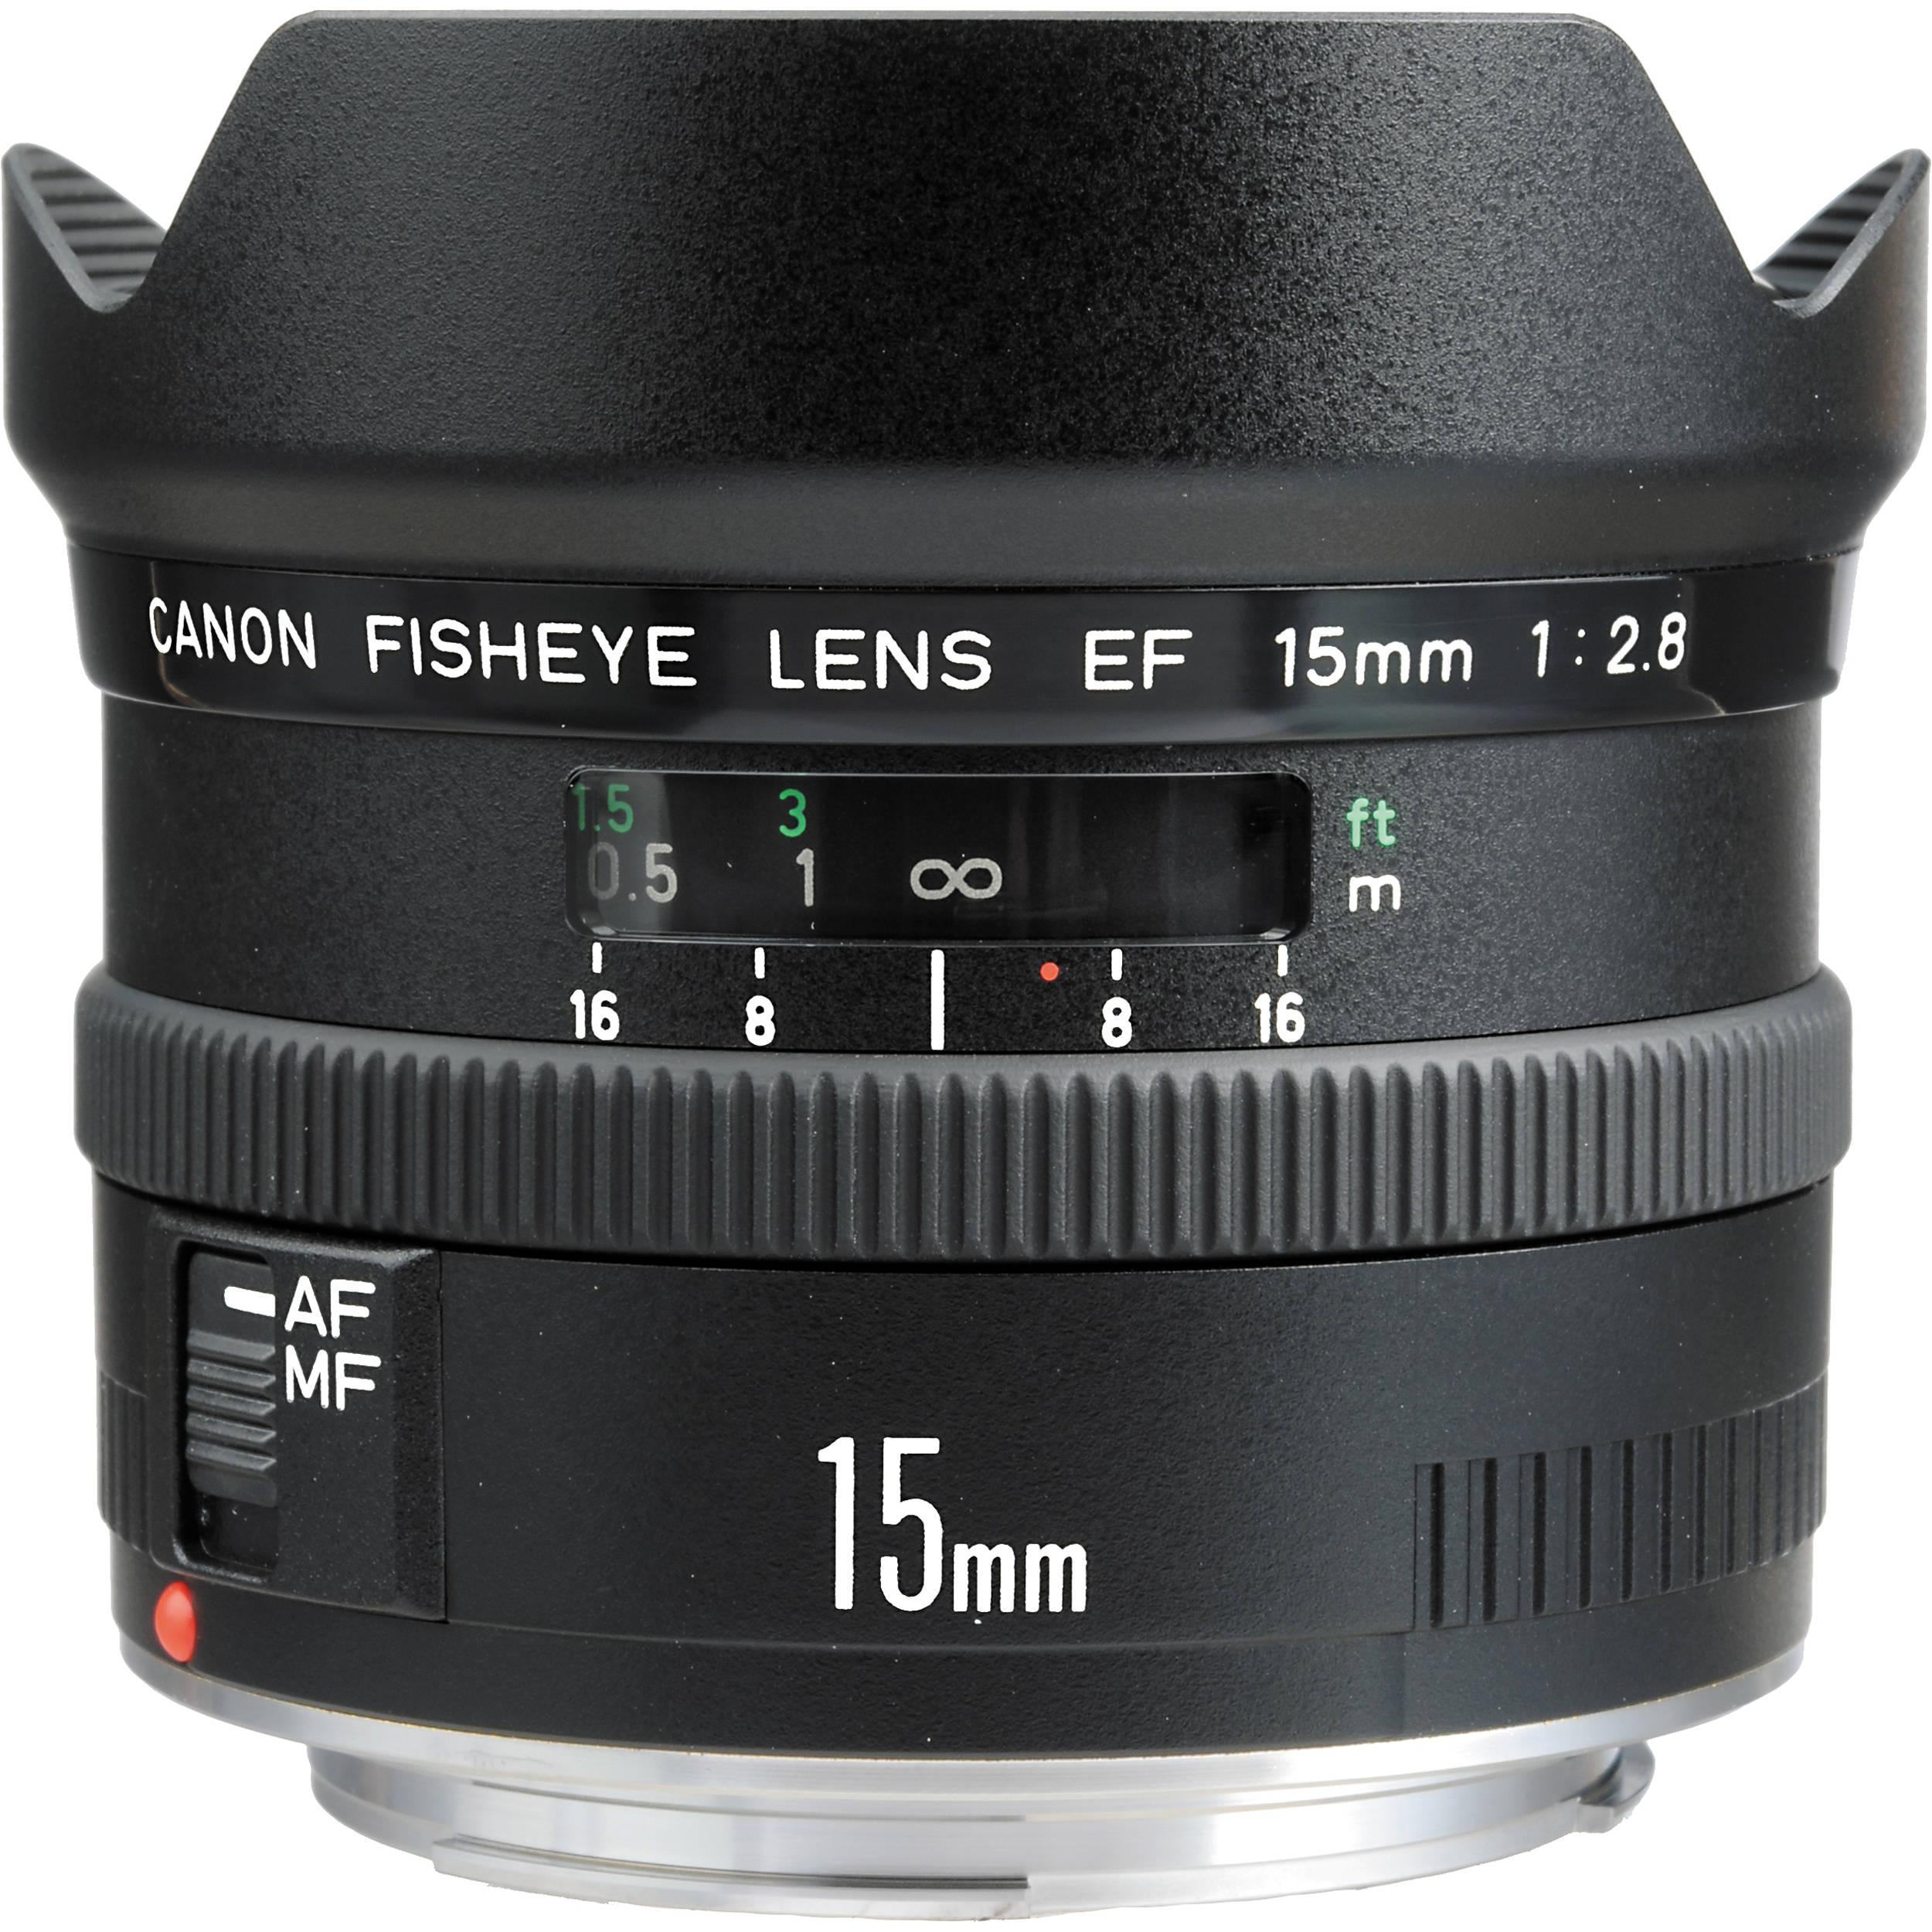 Canon fisheye ef 15mm f 2 8 autofocus lens 2535a003 b h photo for Fish eye lense